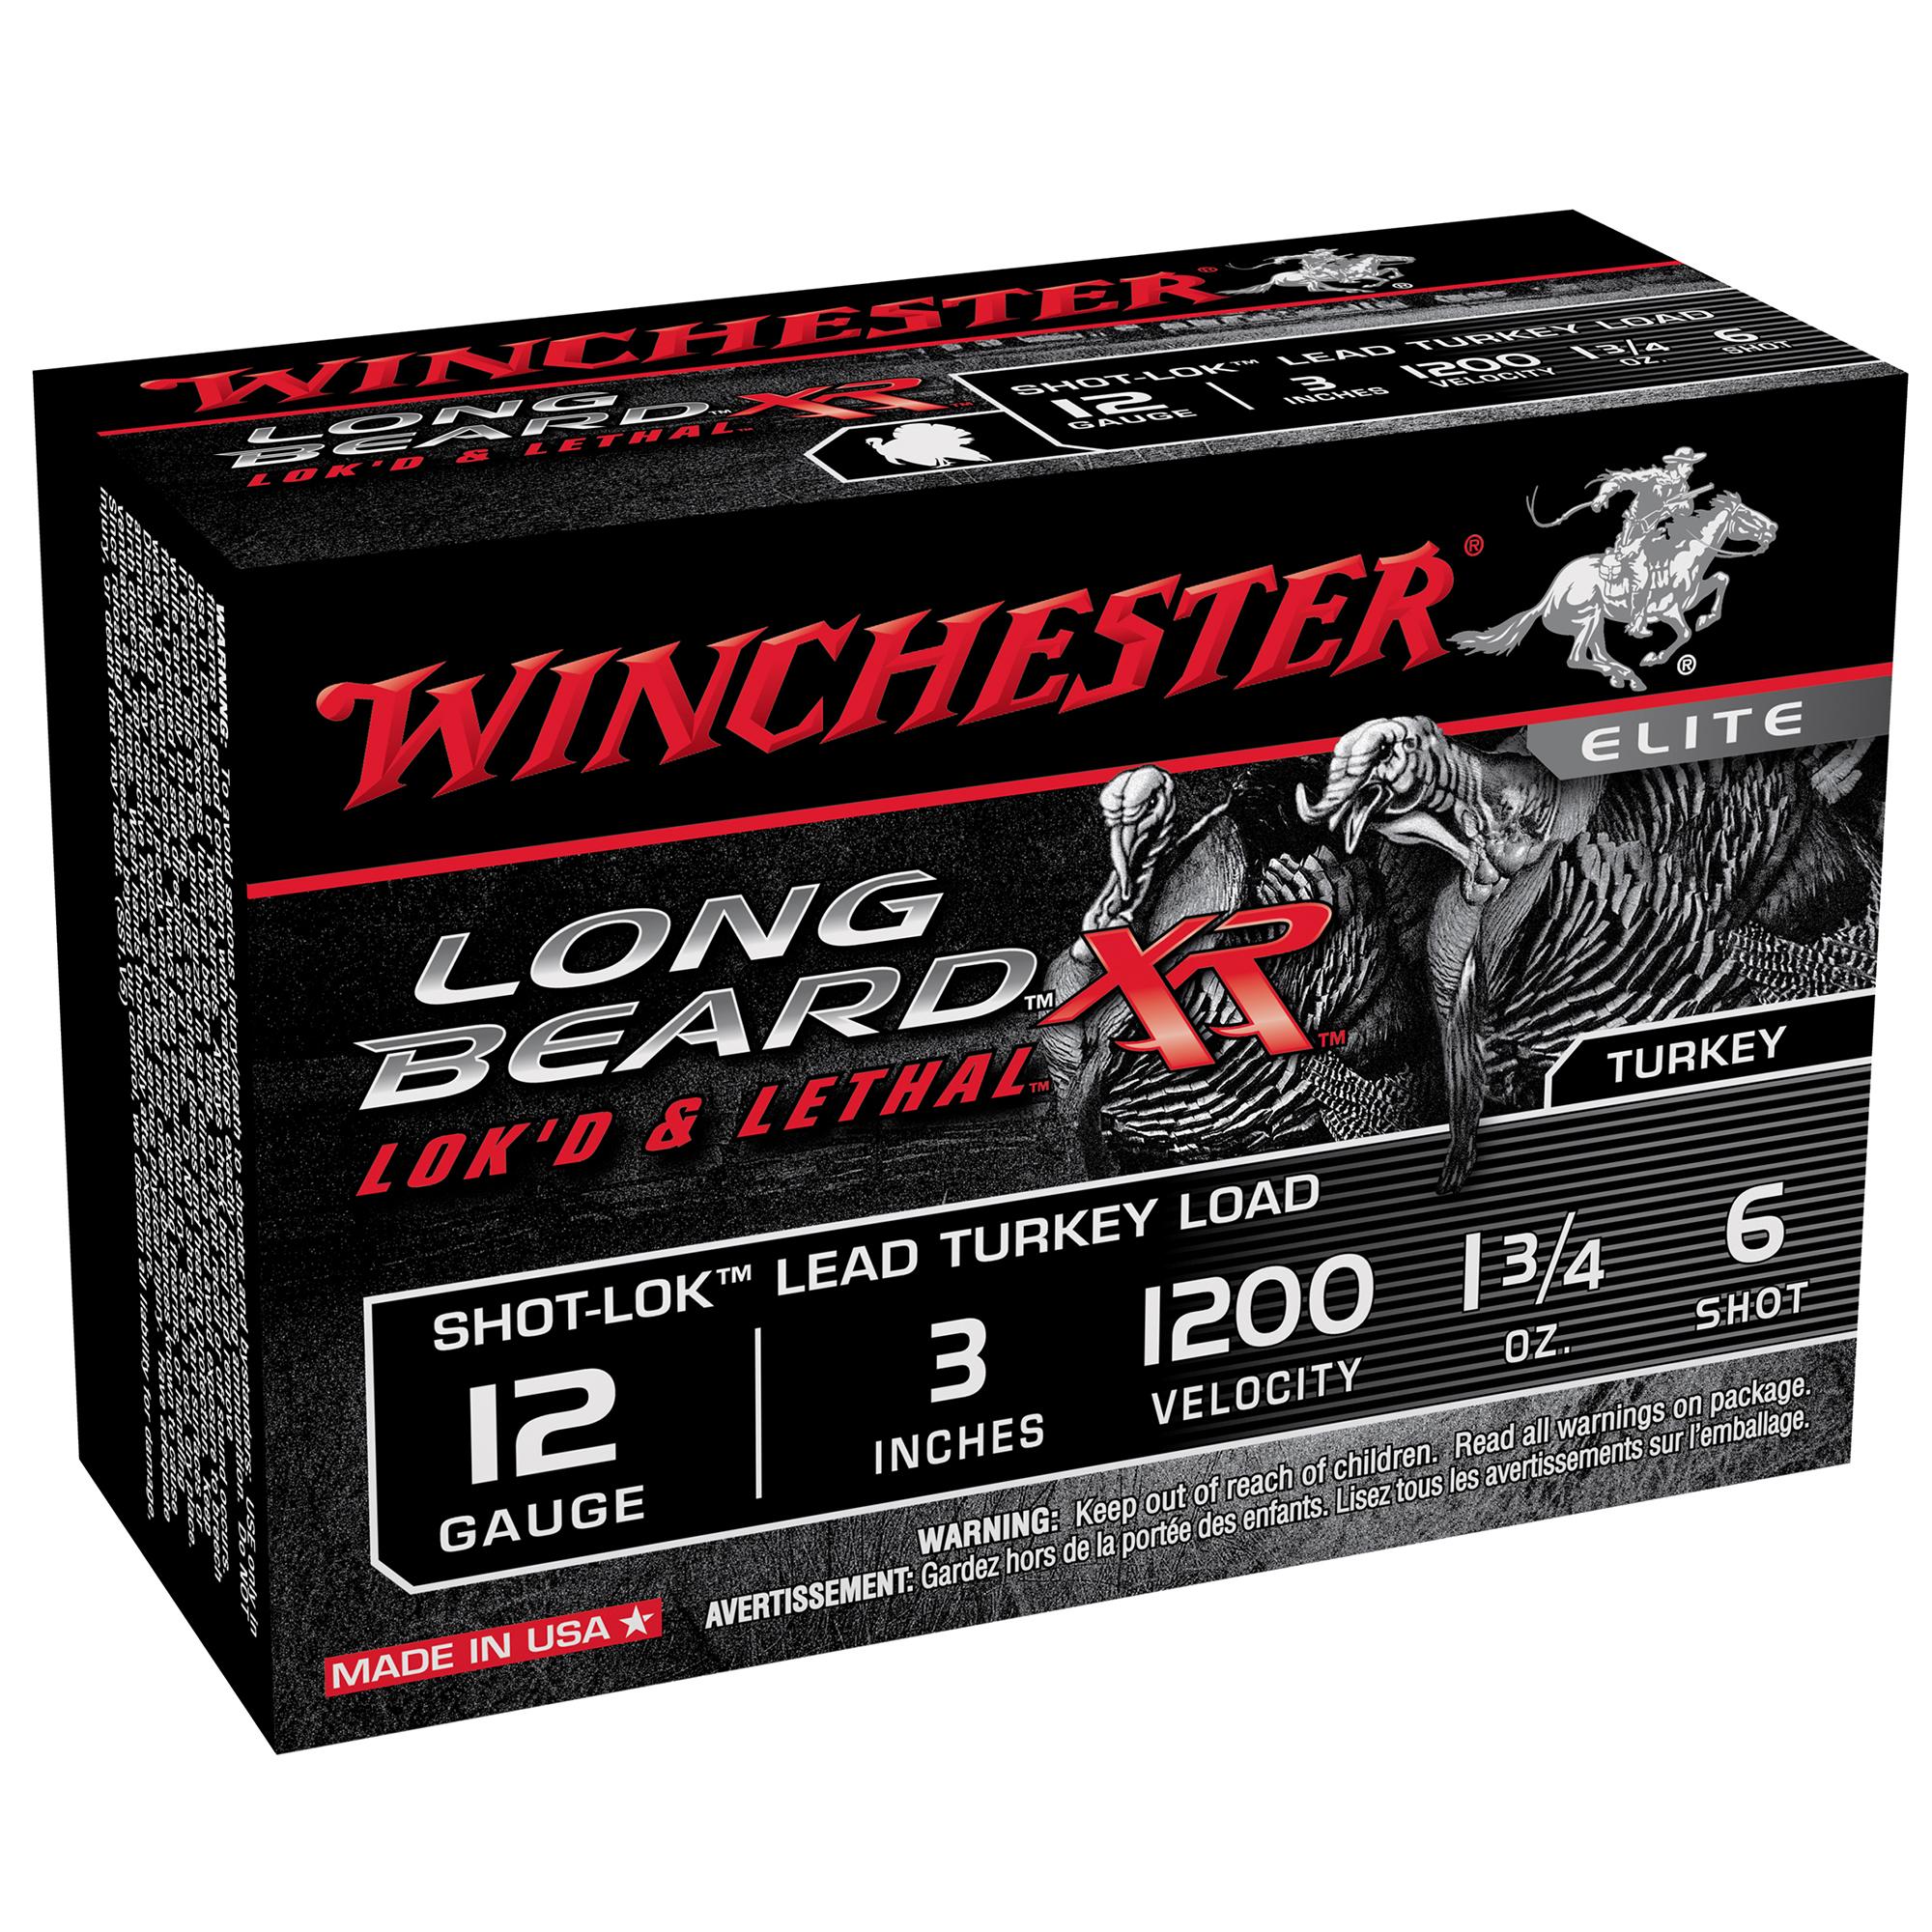 Winchester Long Beard XR Turkey Loads, 12-ga, 3″, 1-3/4 oz, #6